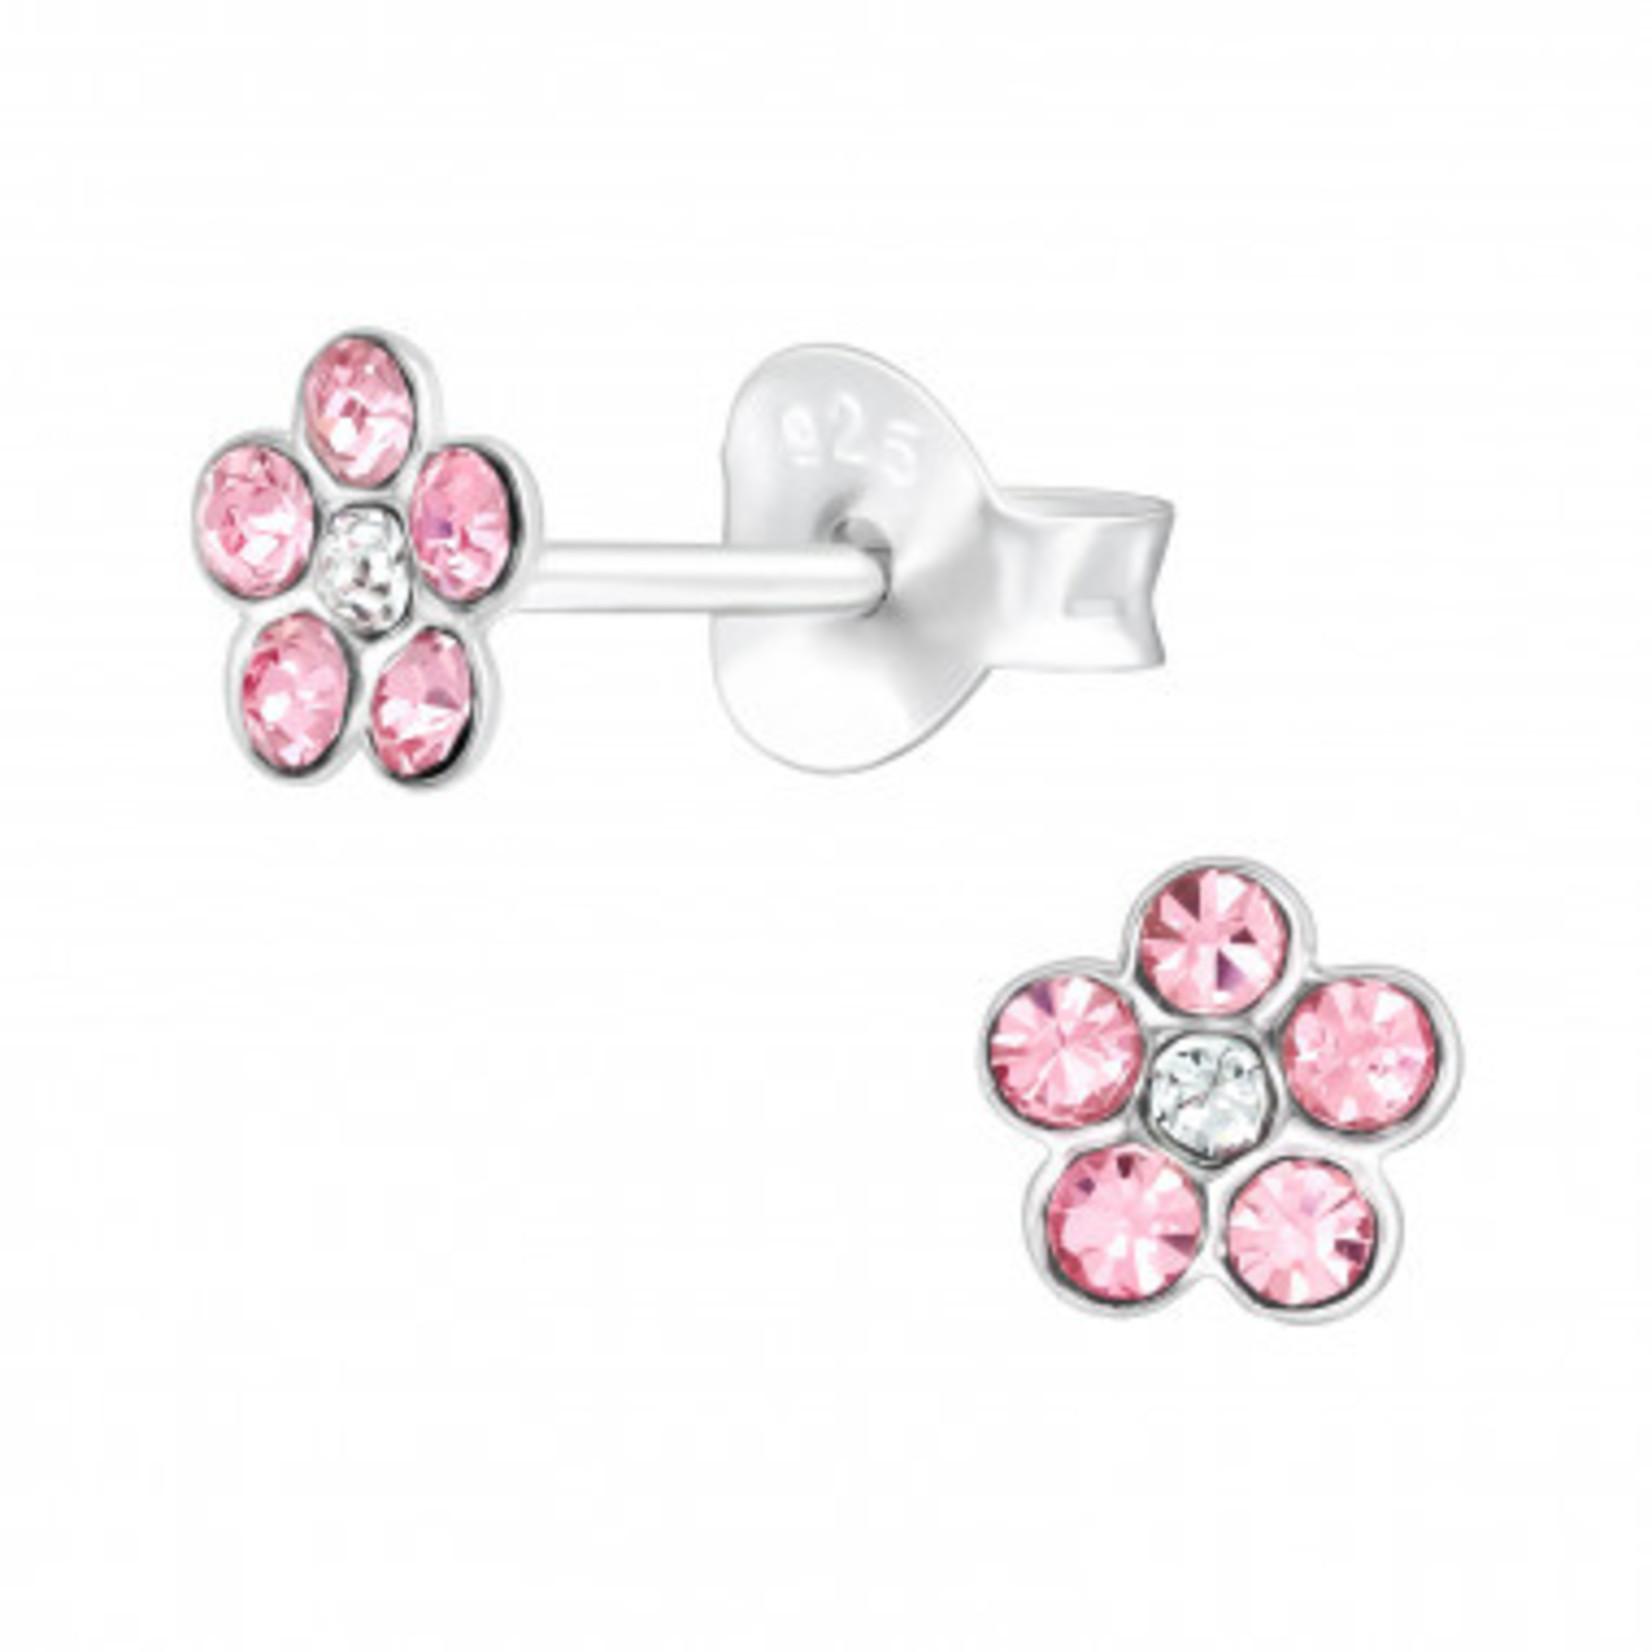 Oorstekers - Bloem - Roze met diamantjes